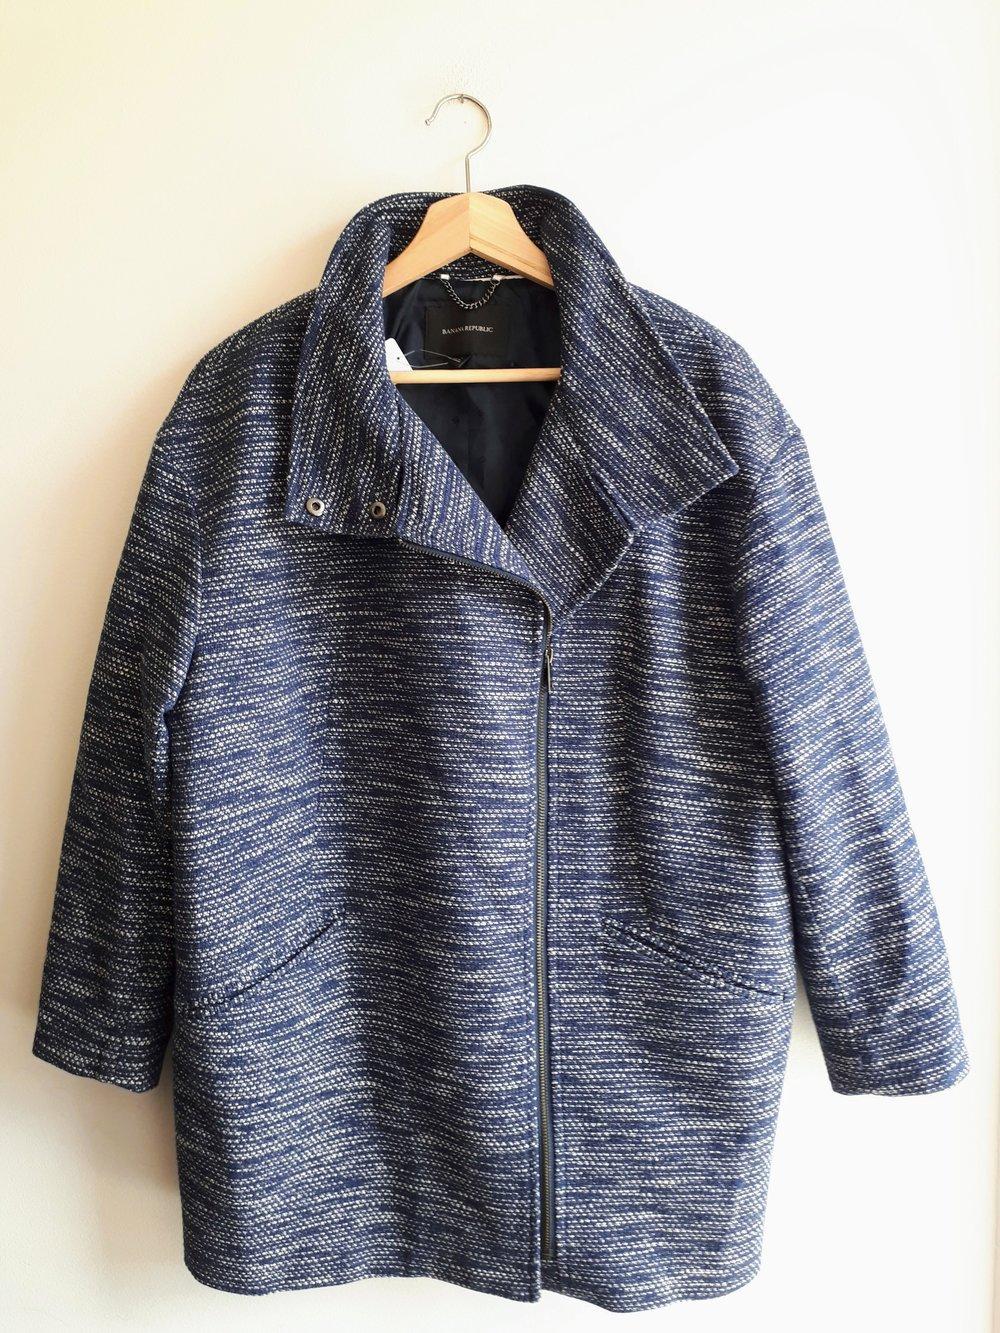 Banana Republic coat (NWT); Size M, $58